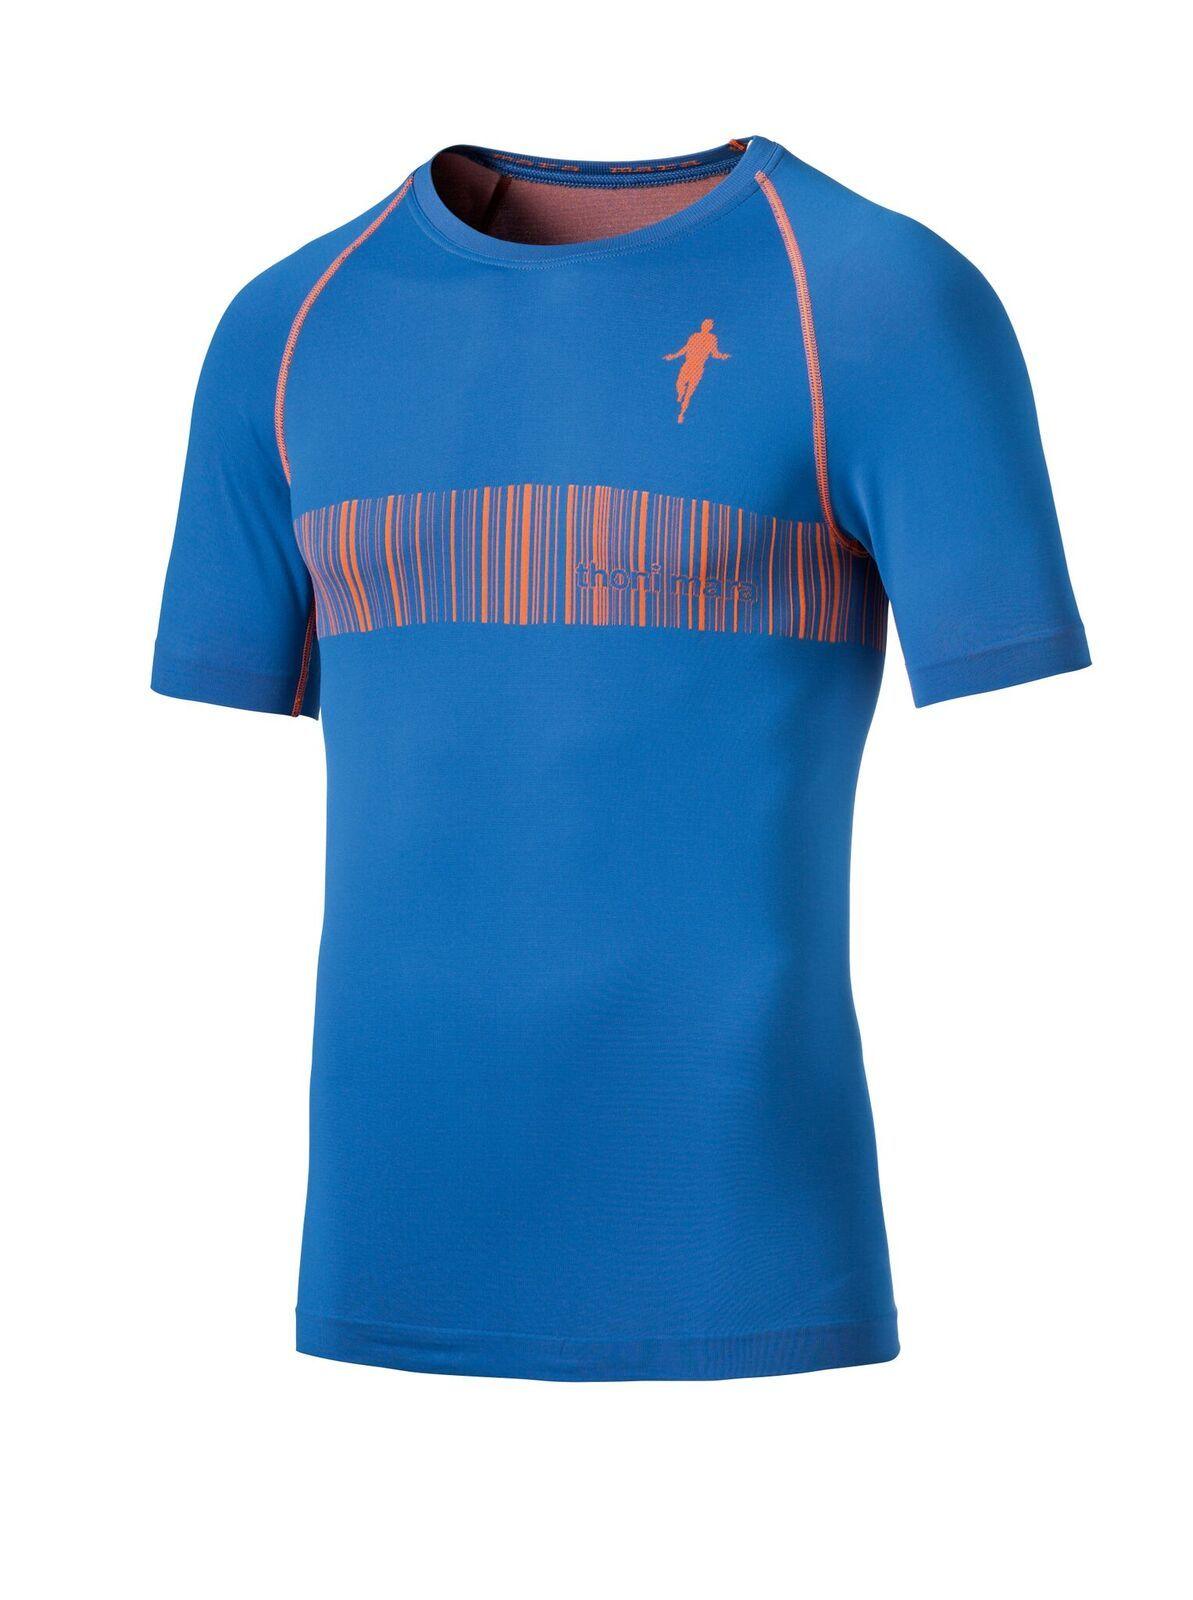 Thonimara Ti Shirt EAN in Grau Orange